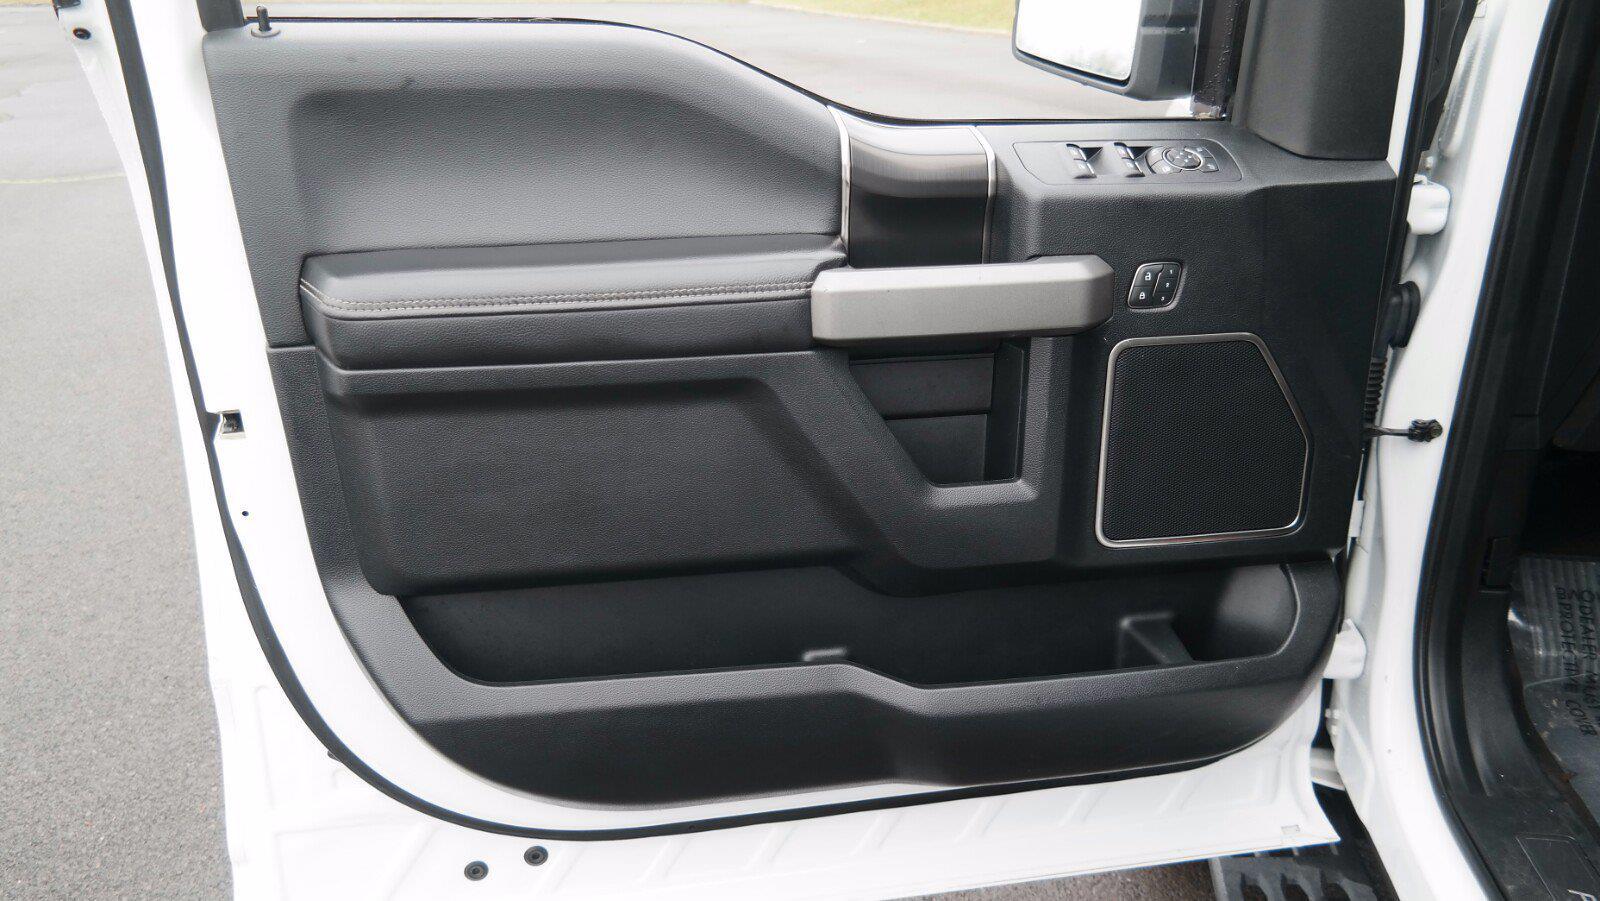 2019 Ford F-150 SuperCrew Cab 4x4, Pickup #FL010231 - photo 12